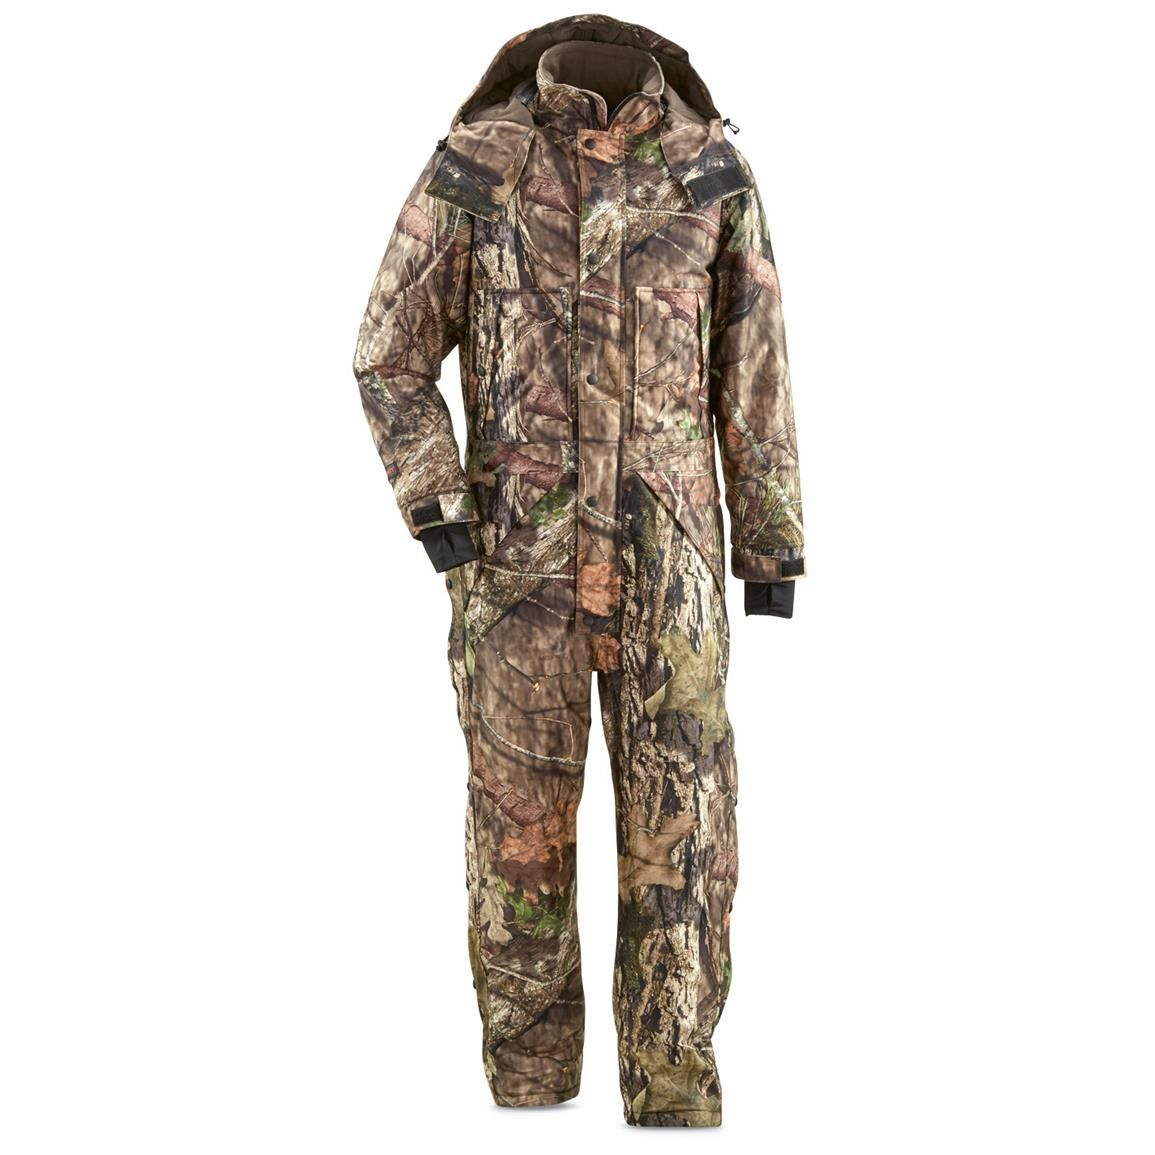 REALTREE Jacket /& Pants Hunting Suit Uniform MossyOak Bass Fishing Hiking